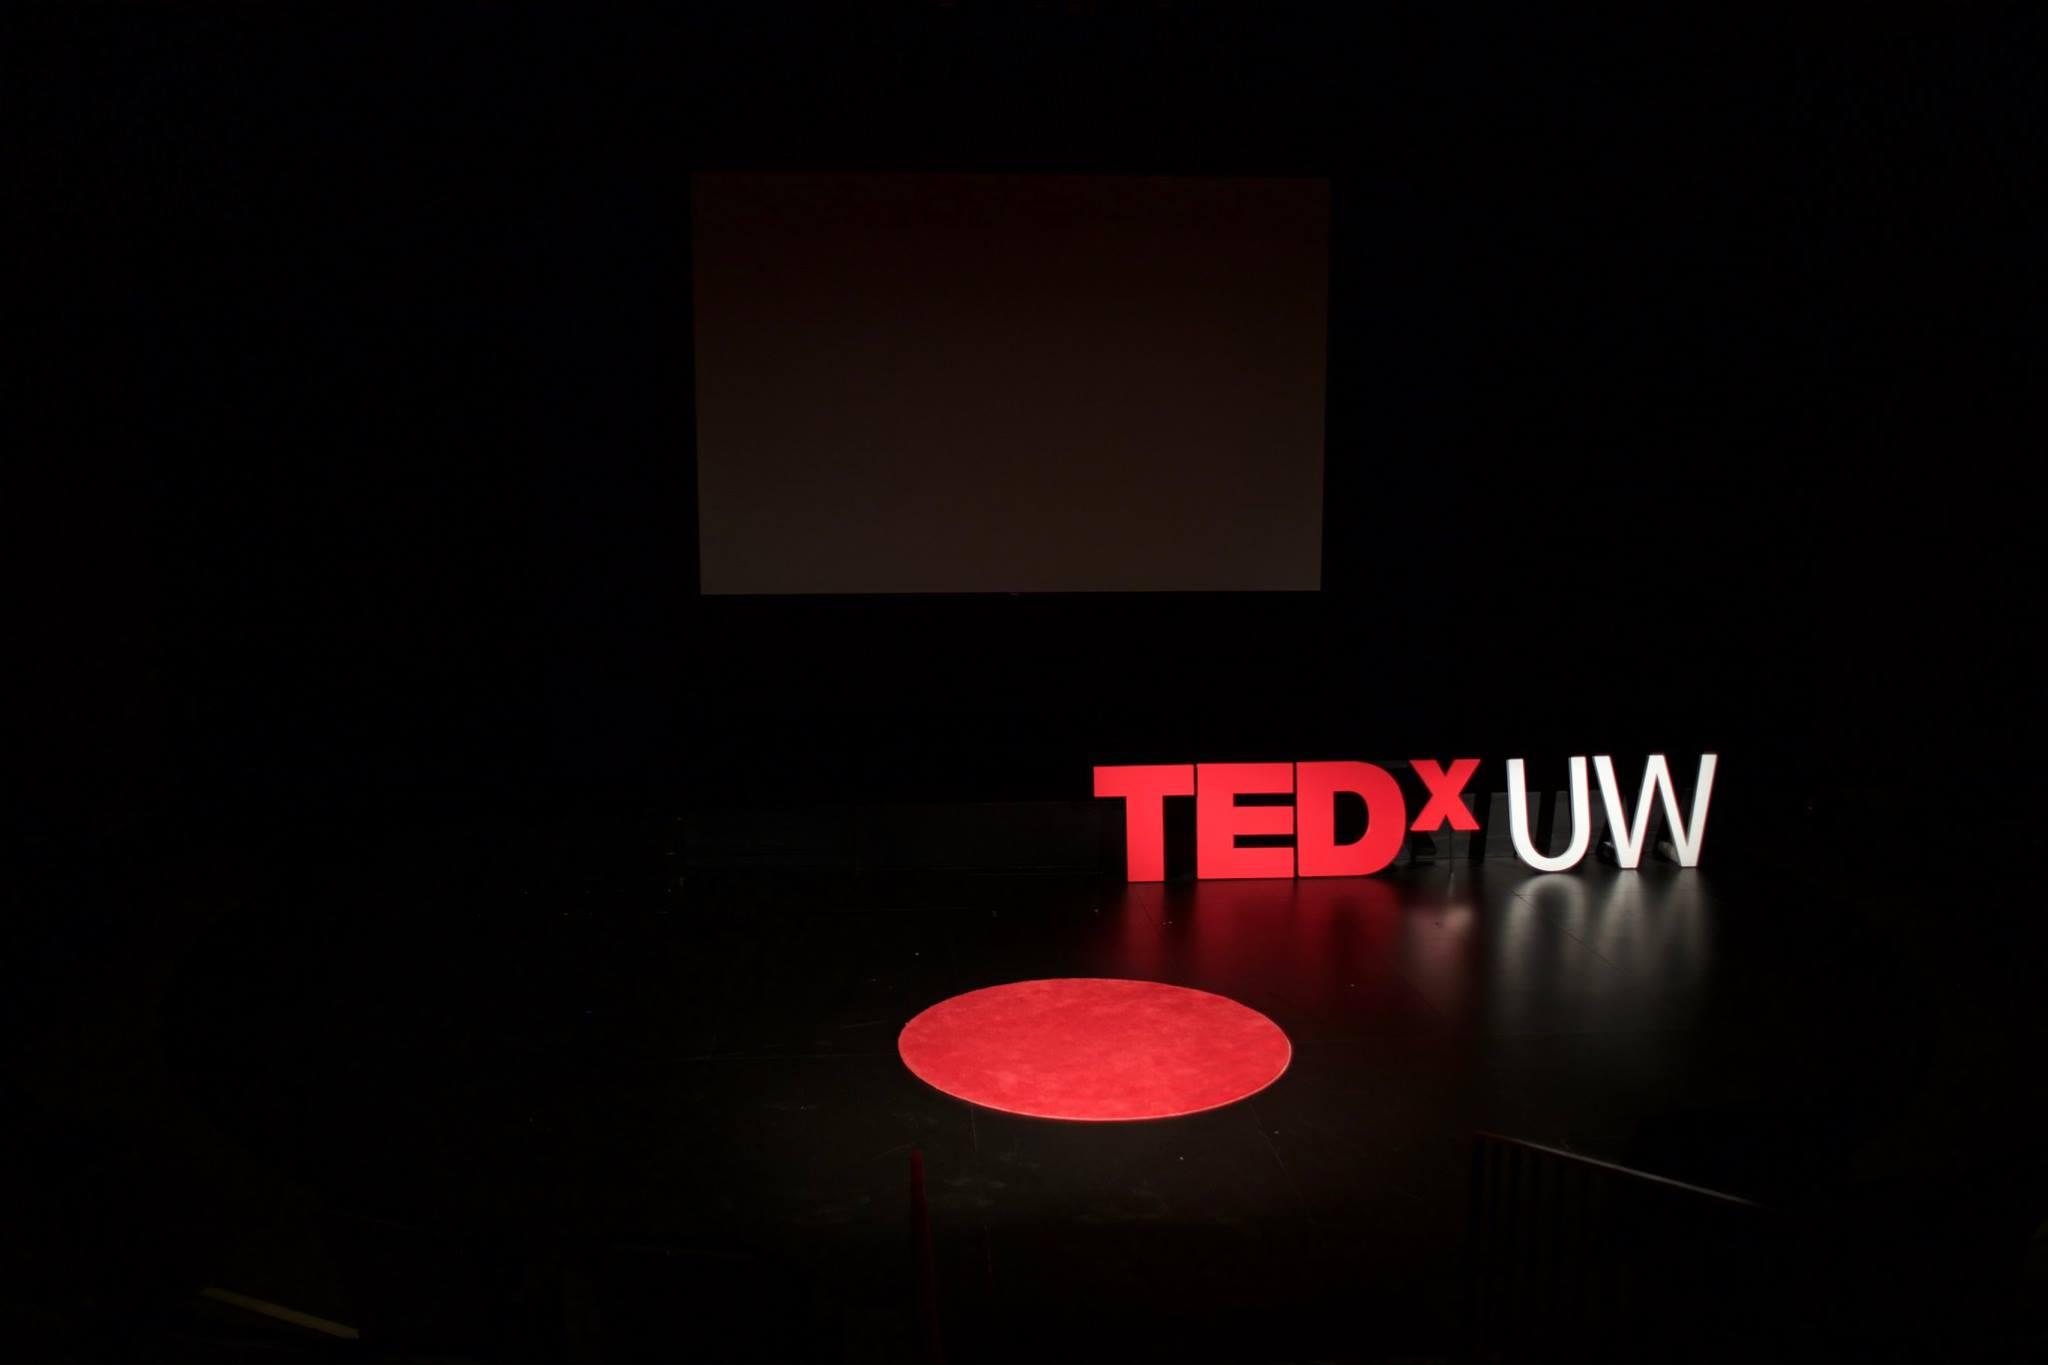 TEDxUW Stage, 2016